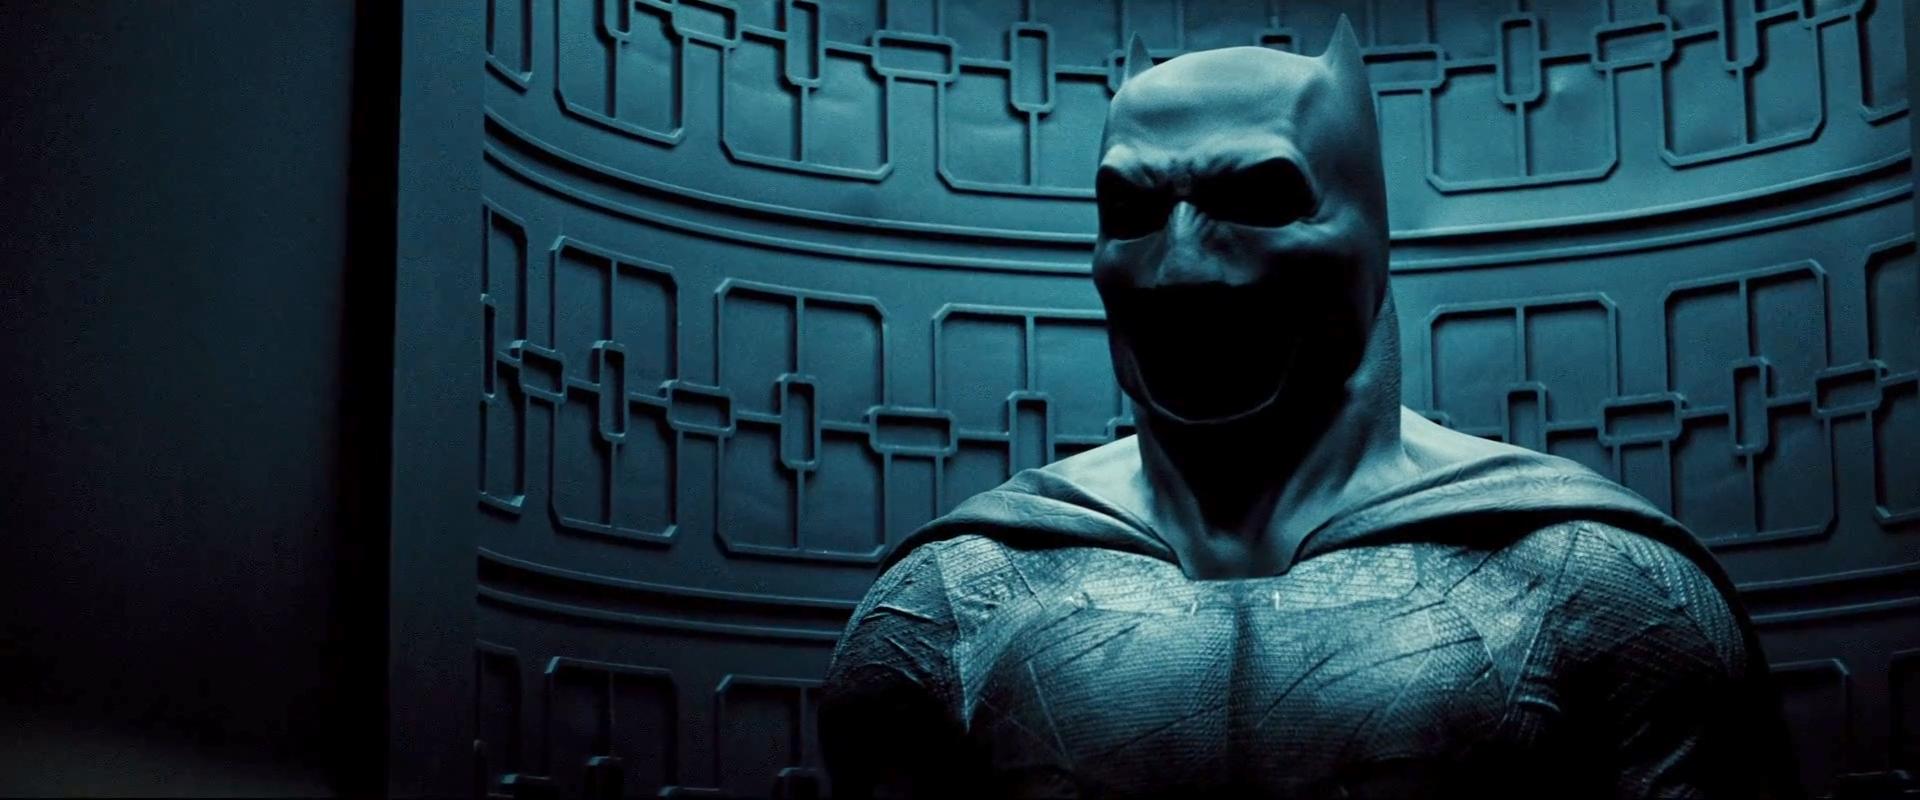 Batman V Superman Trailer Cowl Batsuit Full